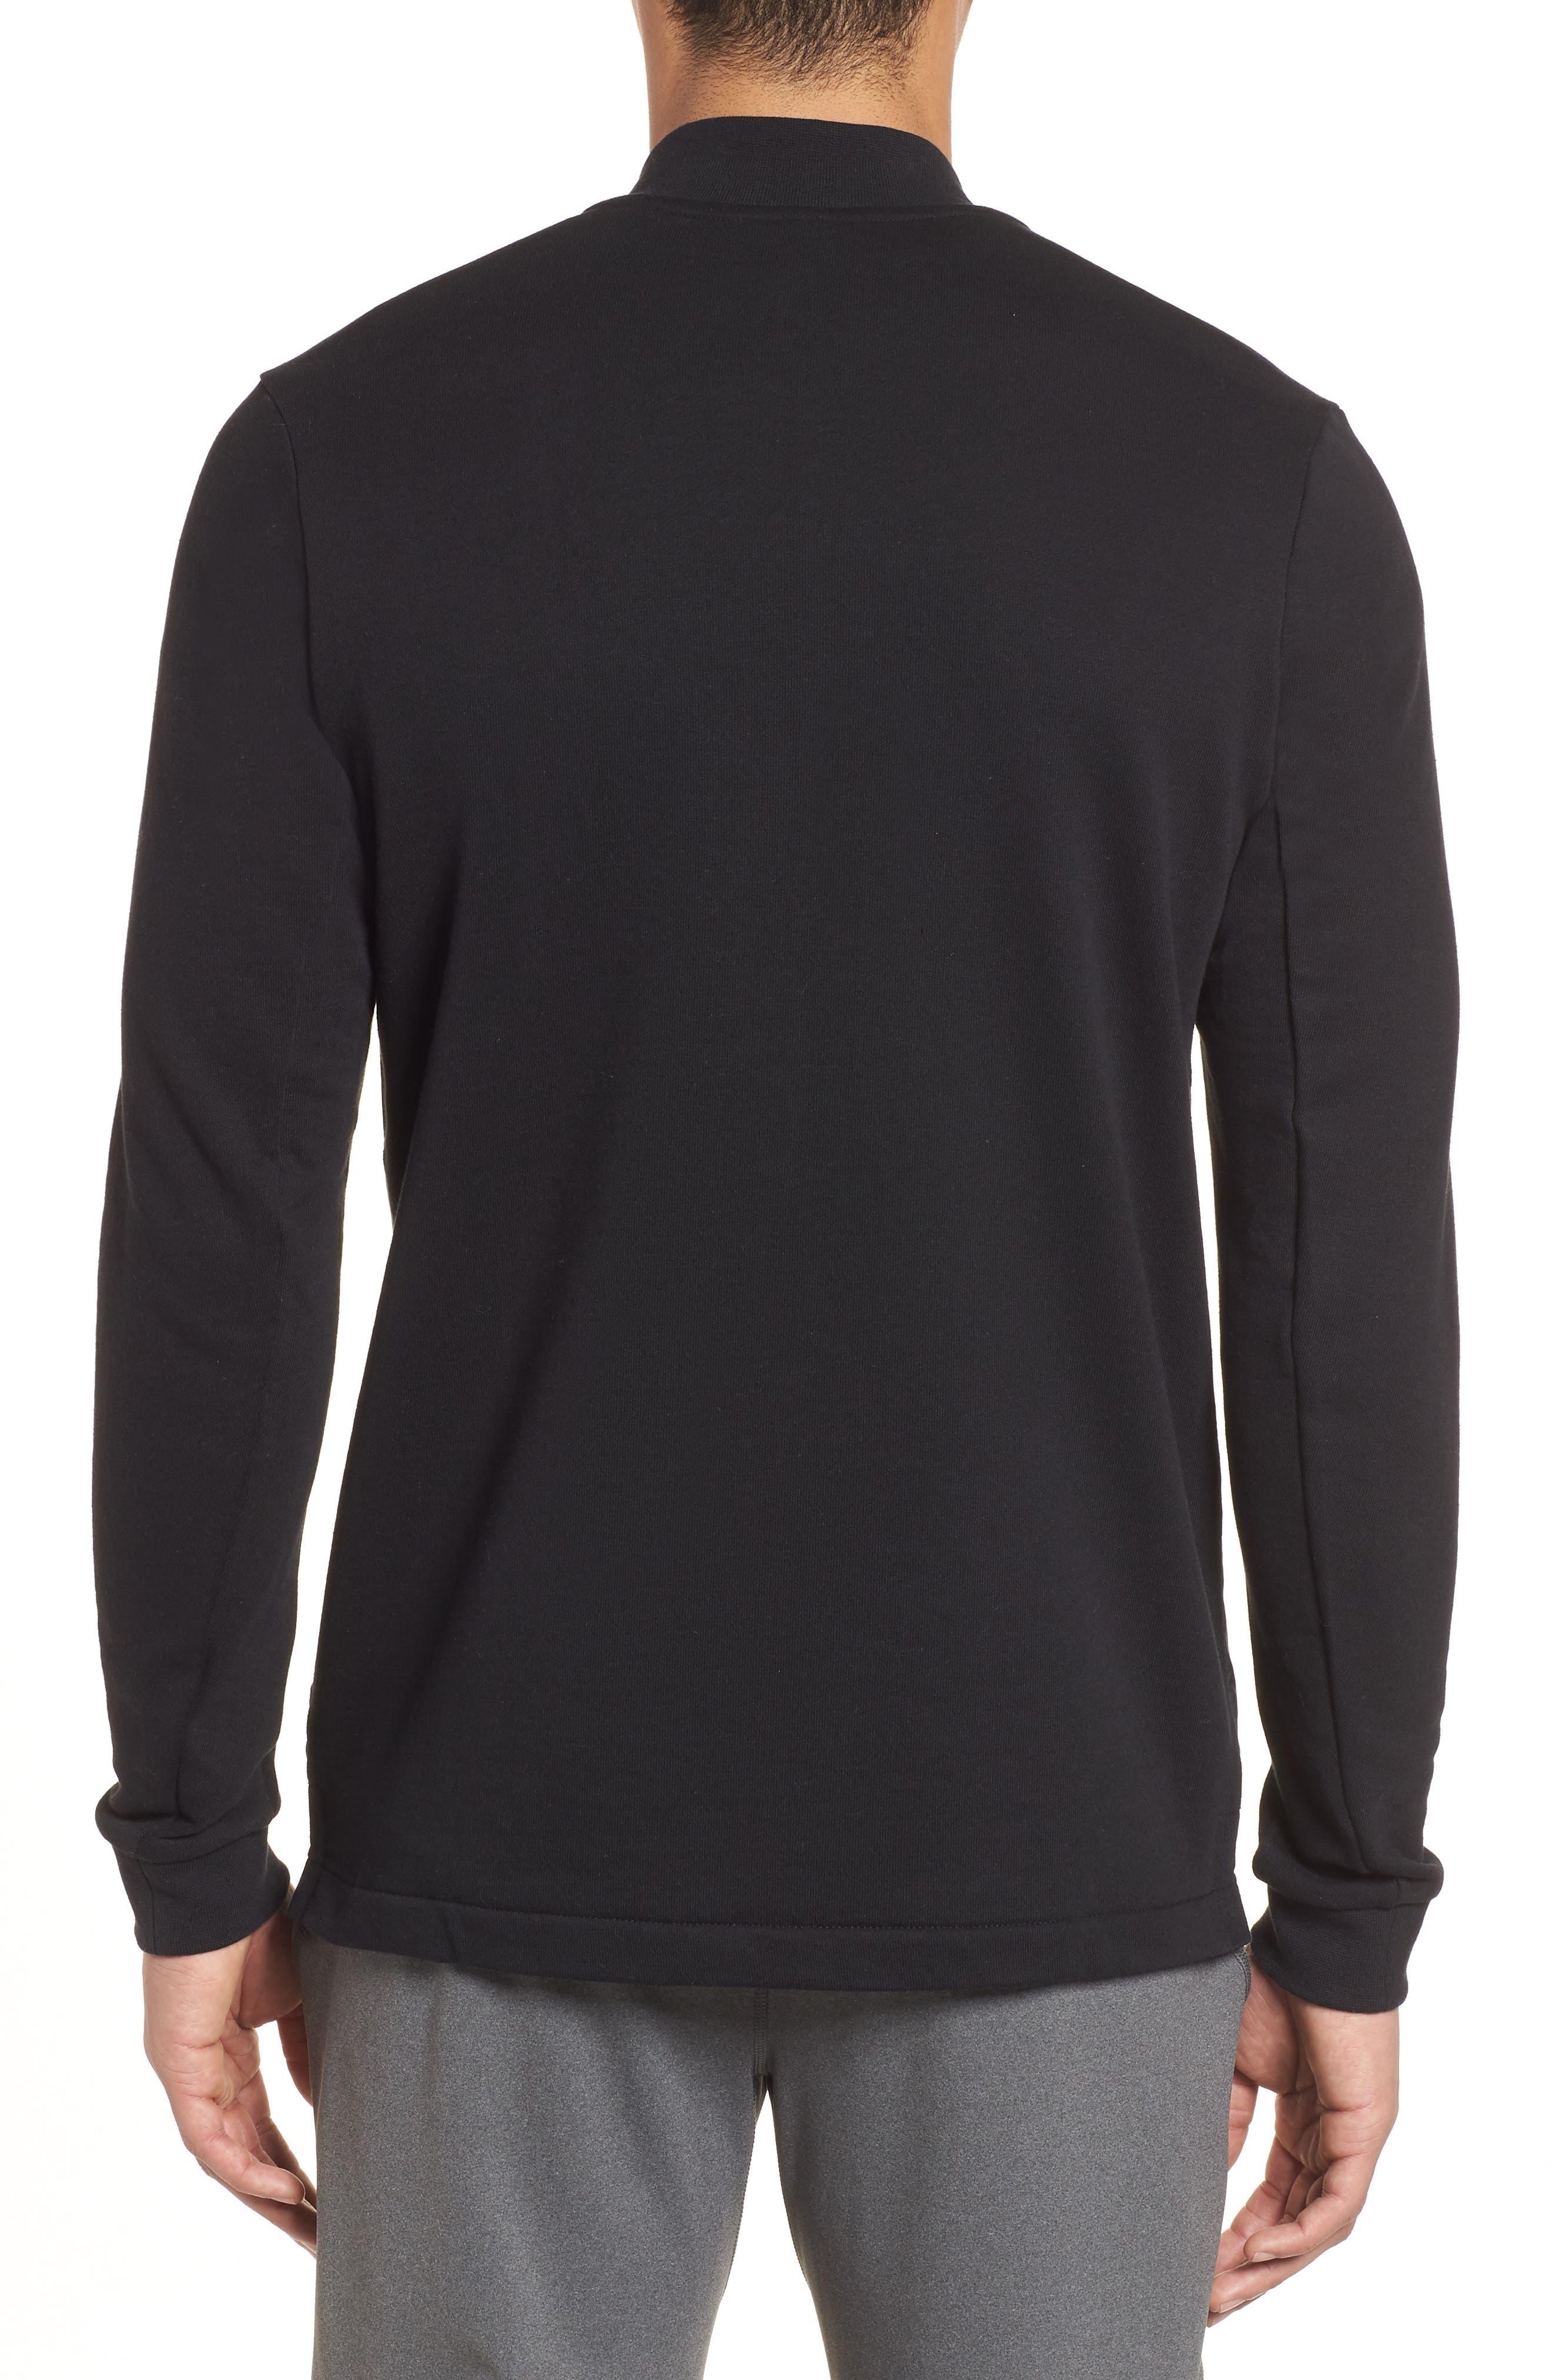 NSW Modern Track Jacket,                             Alternate thumbnail 2, color,                             Black/ Black